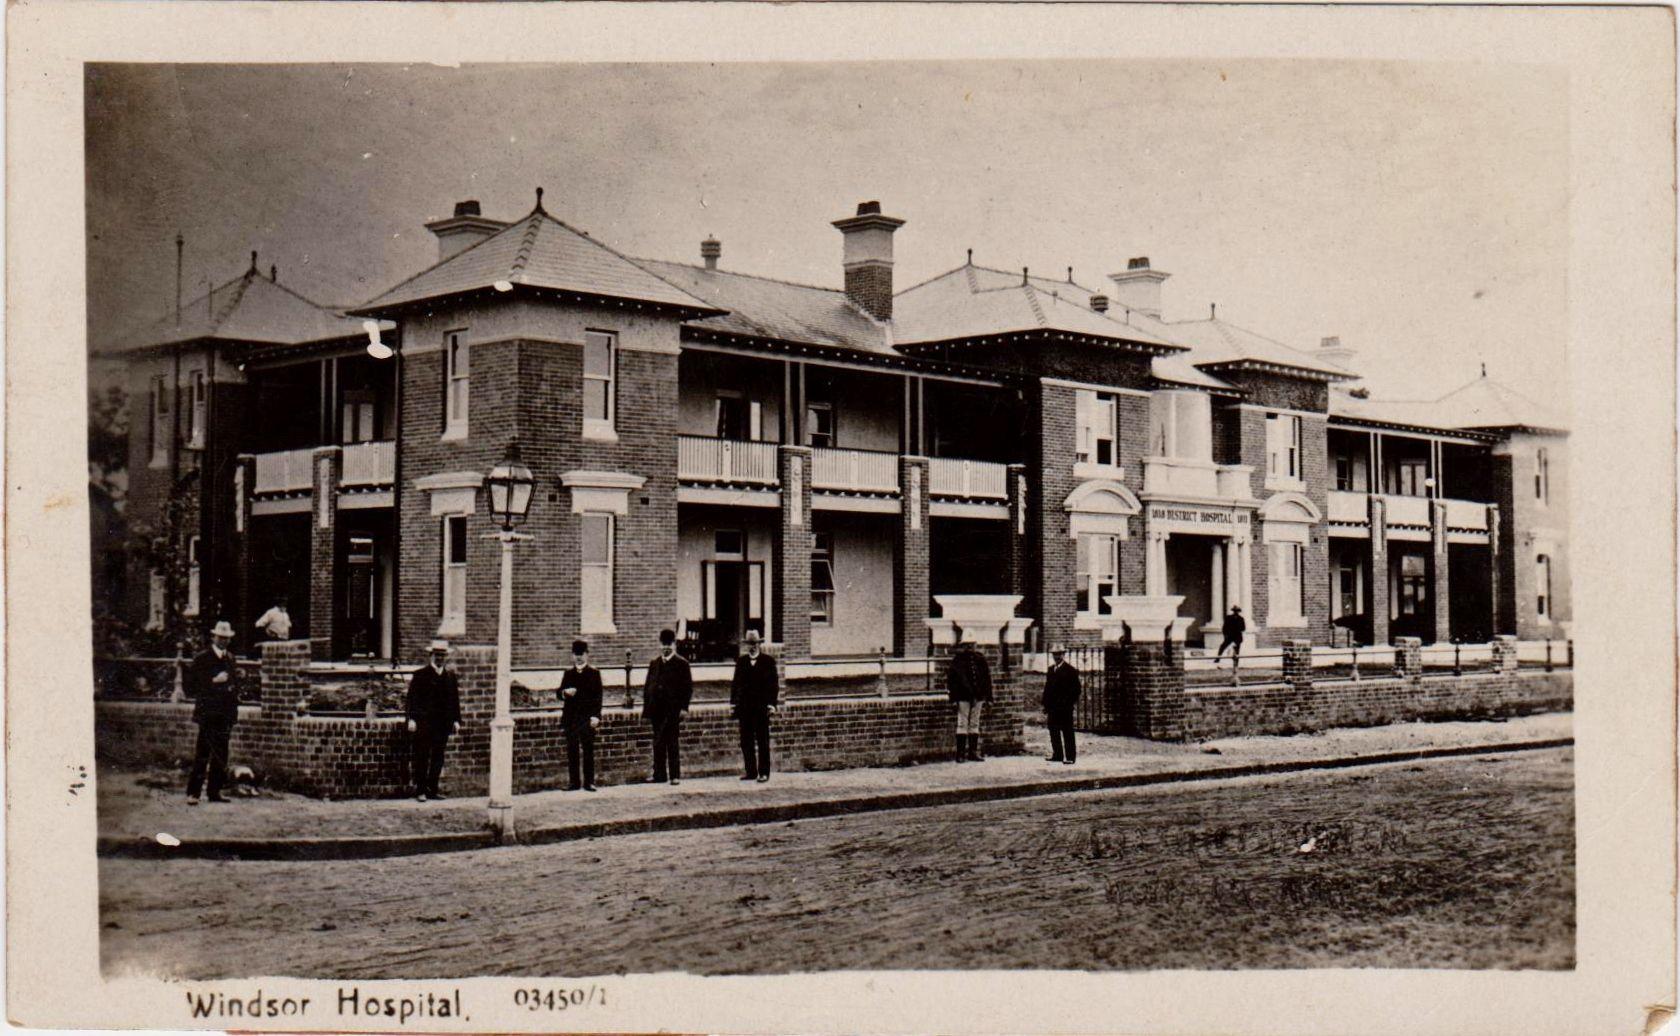 Windsor Hospital, NSW Australian road trip, Australia